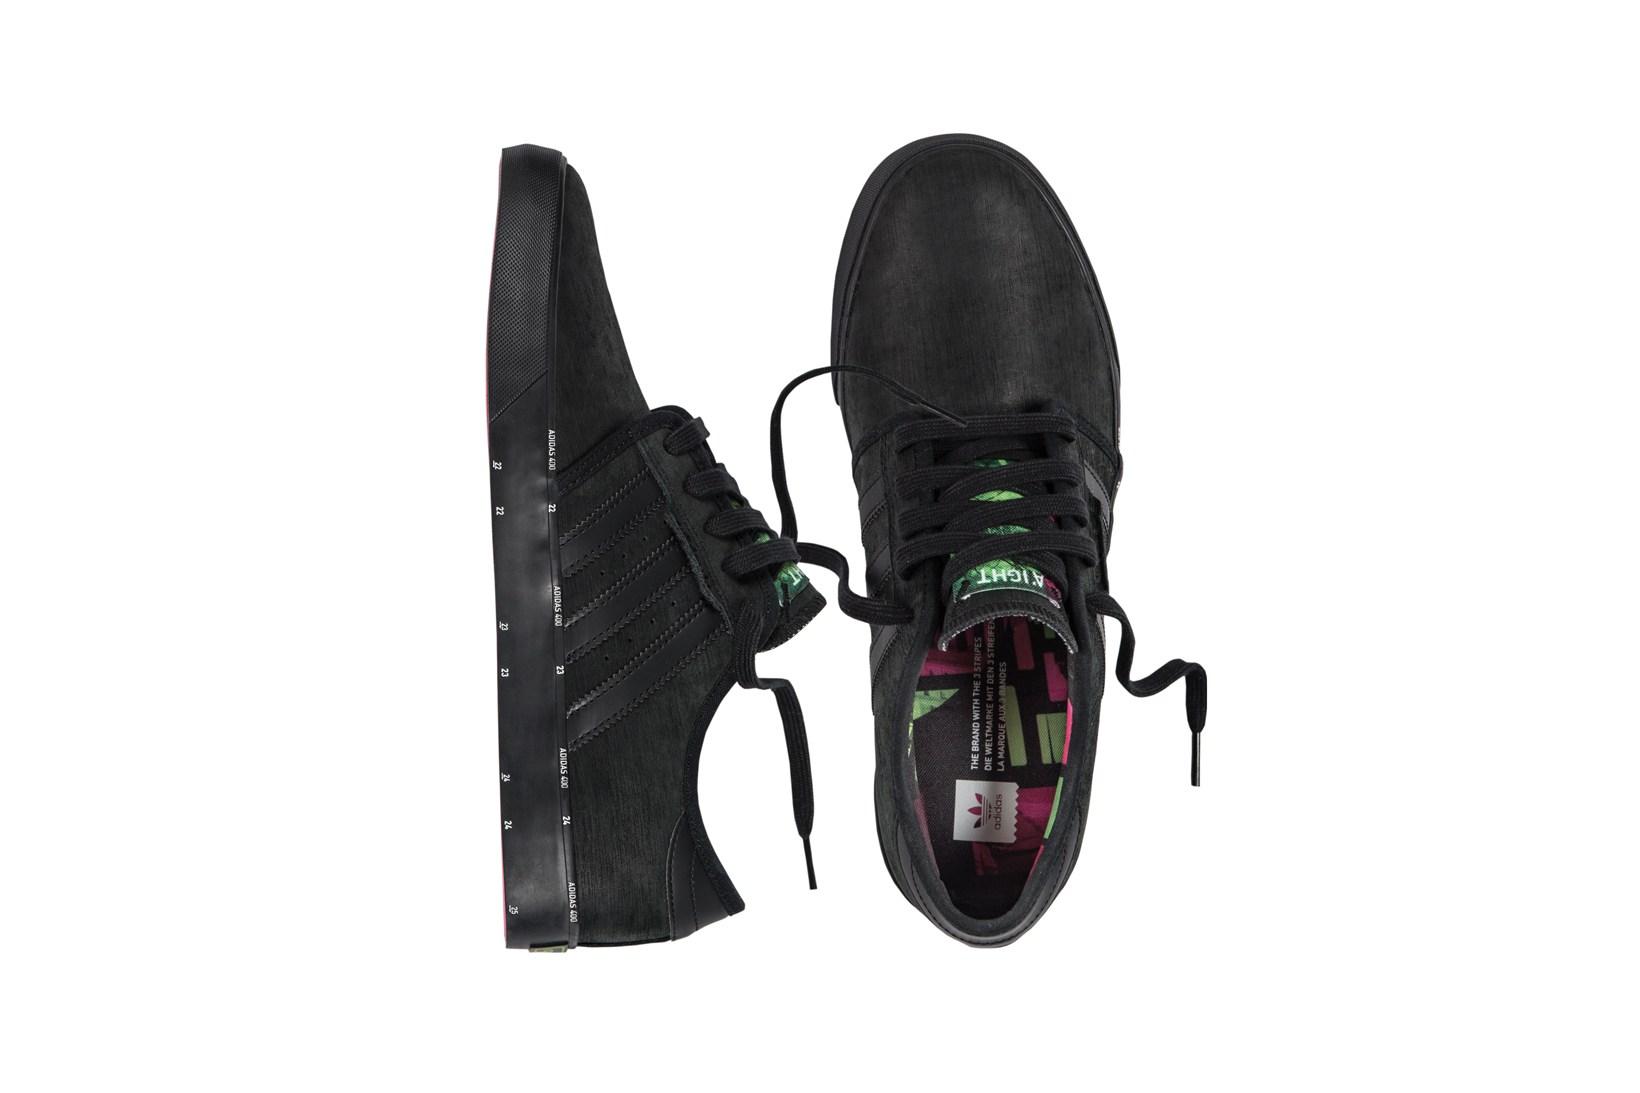 ari-marcopoulos-adidas-skateboarding-closer-look-2